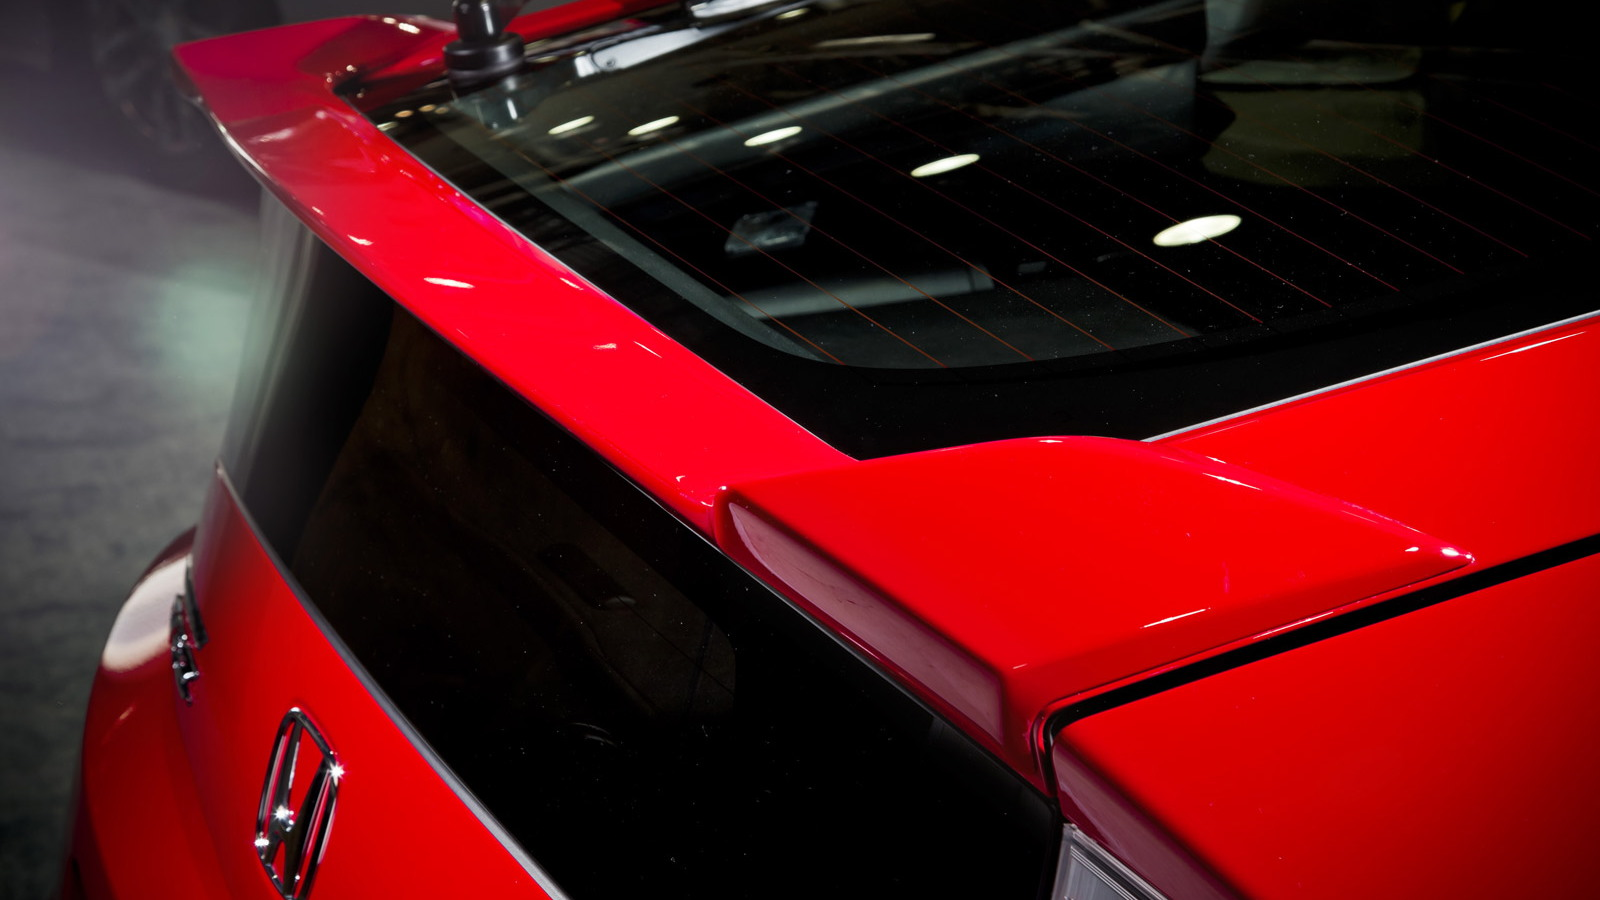 Supercharged Honda CR-Z concept, 2012 SEMA show